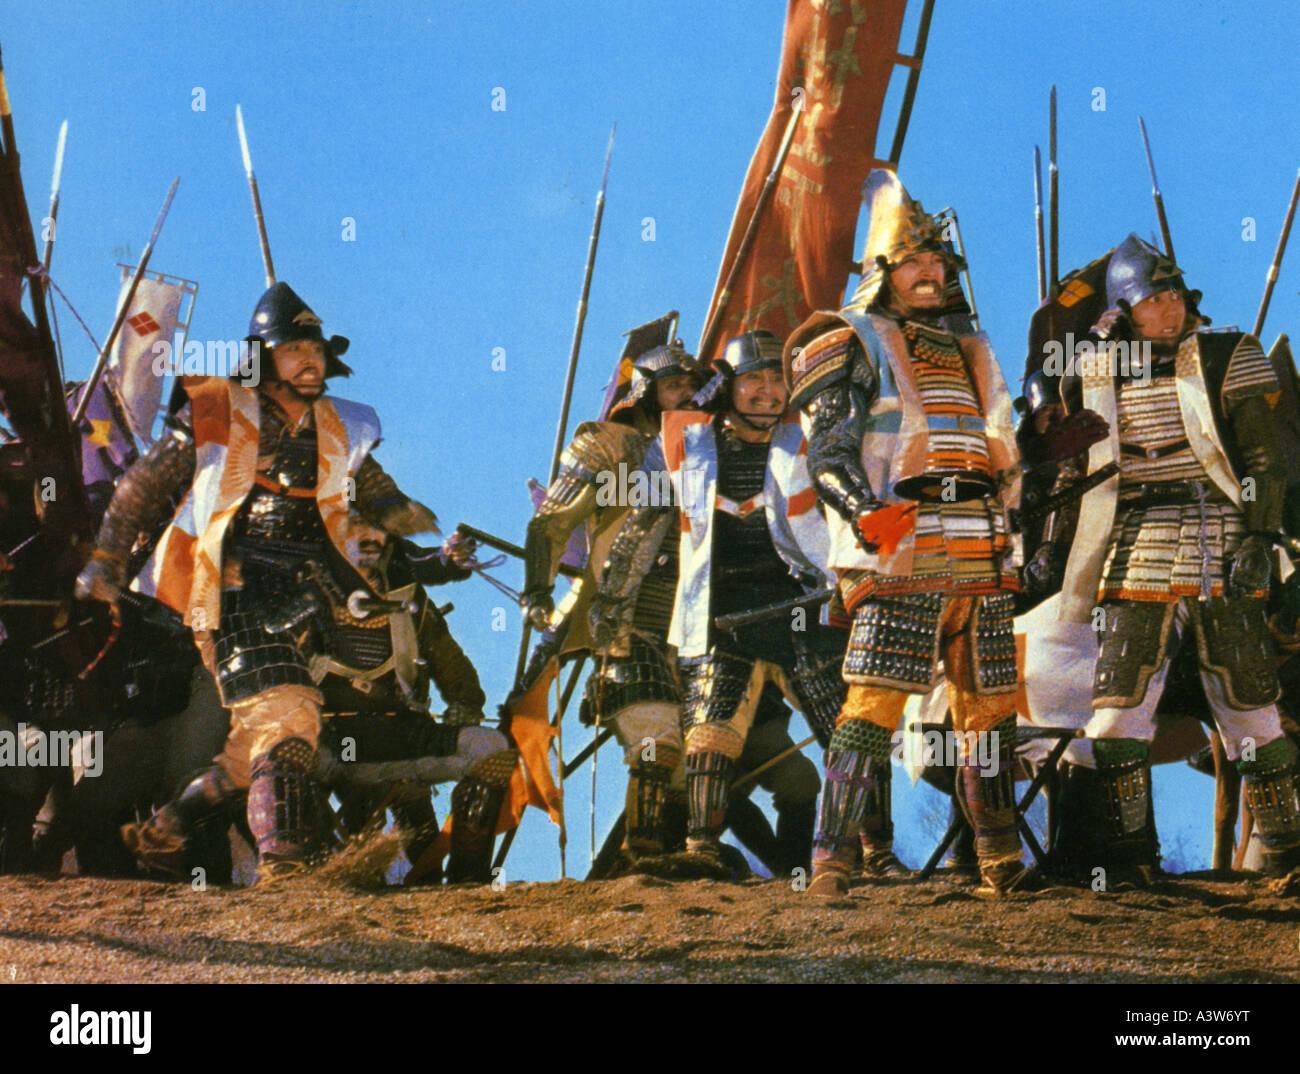 KAGEMUSHA 1980 TCF/Toho film directed by Akira Kurosawa - Stock Image